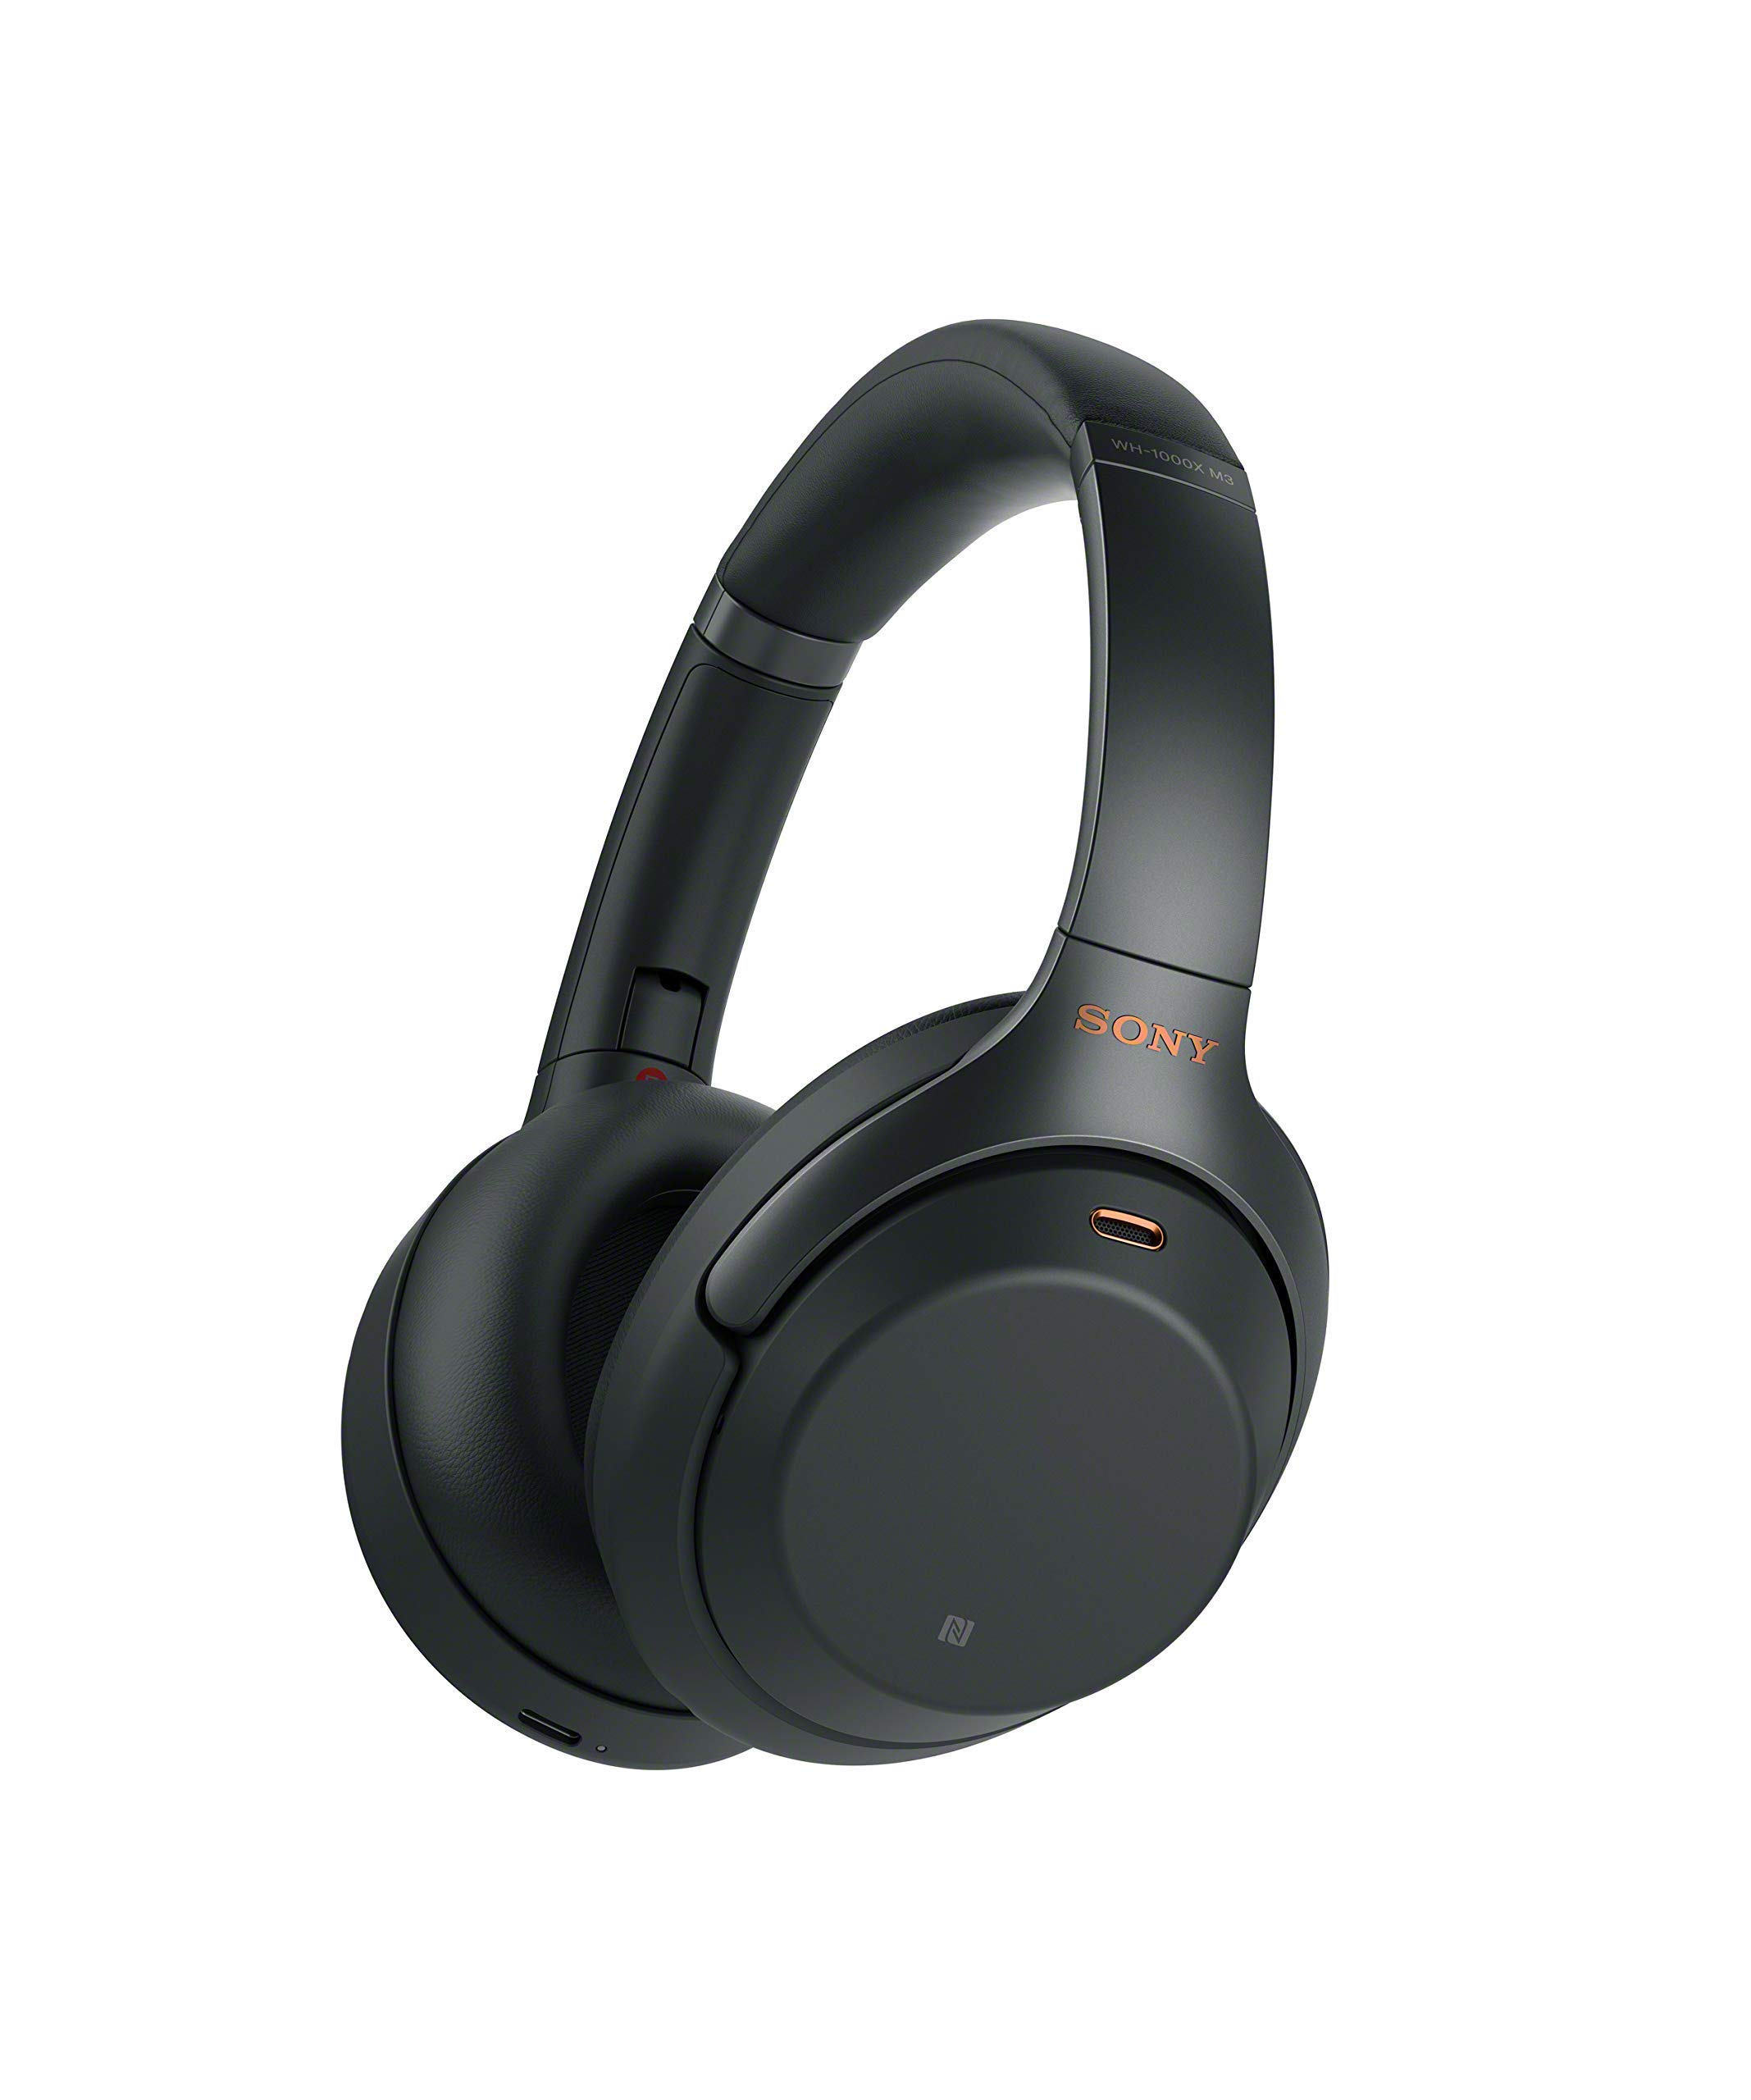 Sony WH1000XM3 Bluetooth Wireless Noise Canceling Headphones, Black WH-1000XM3/B (Renewed) by Sony